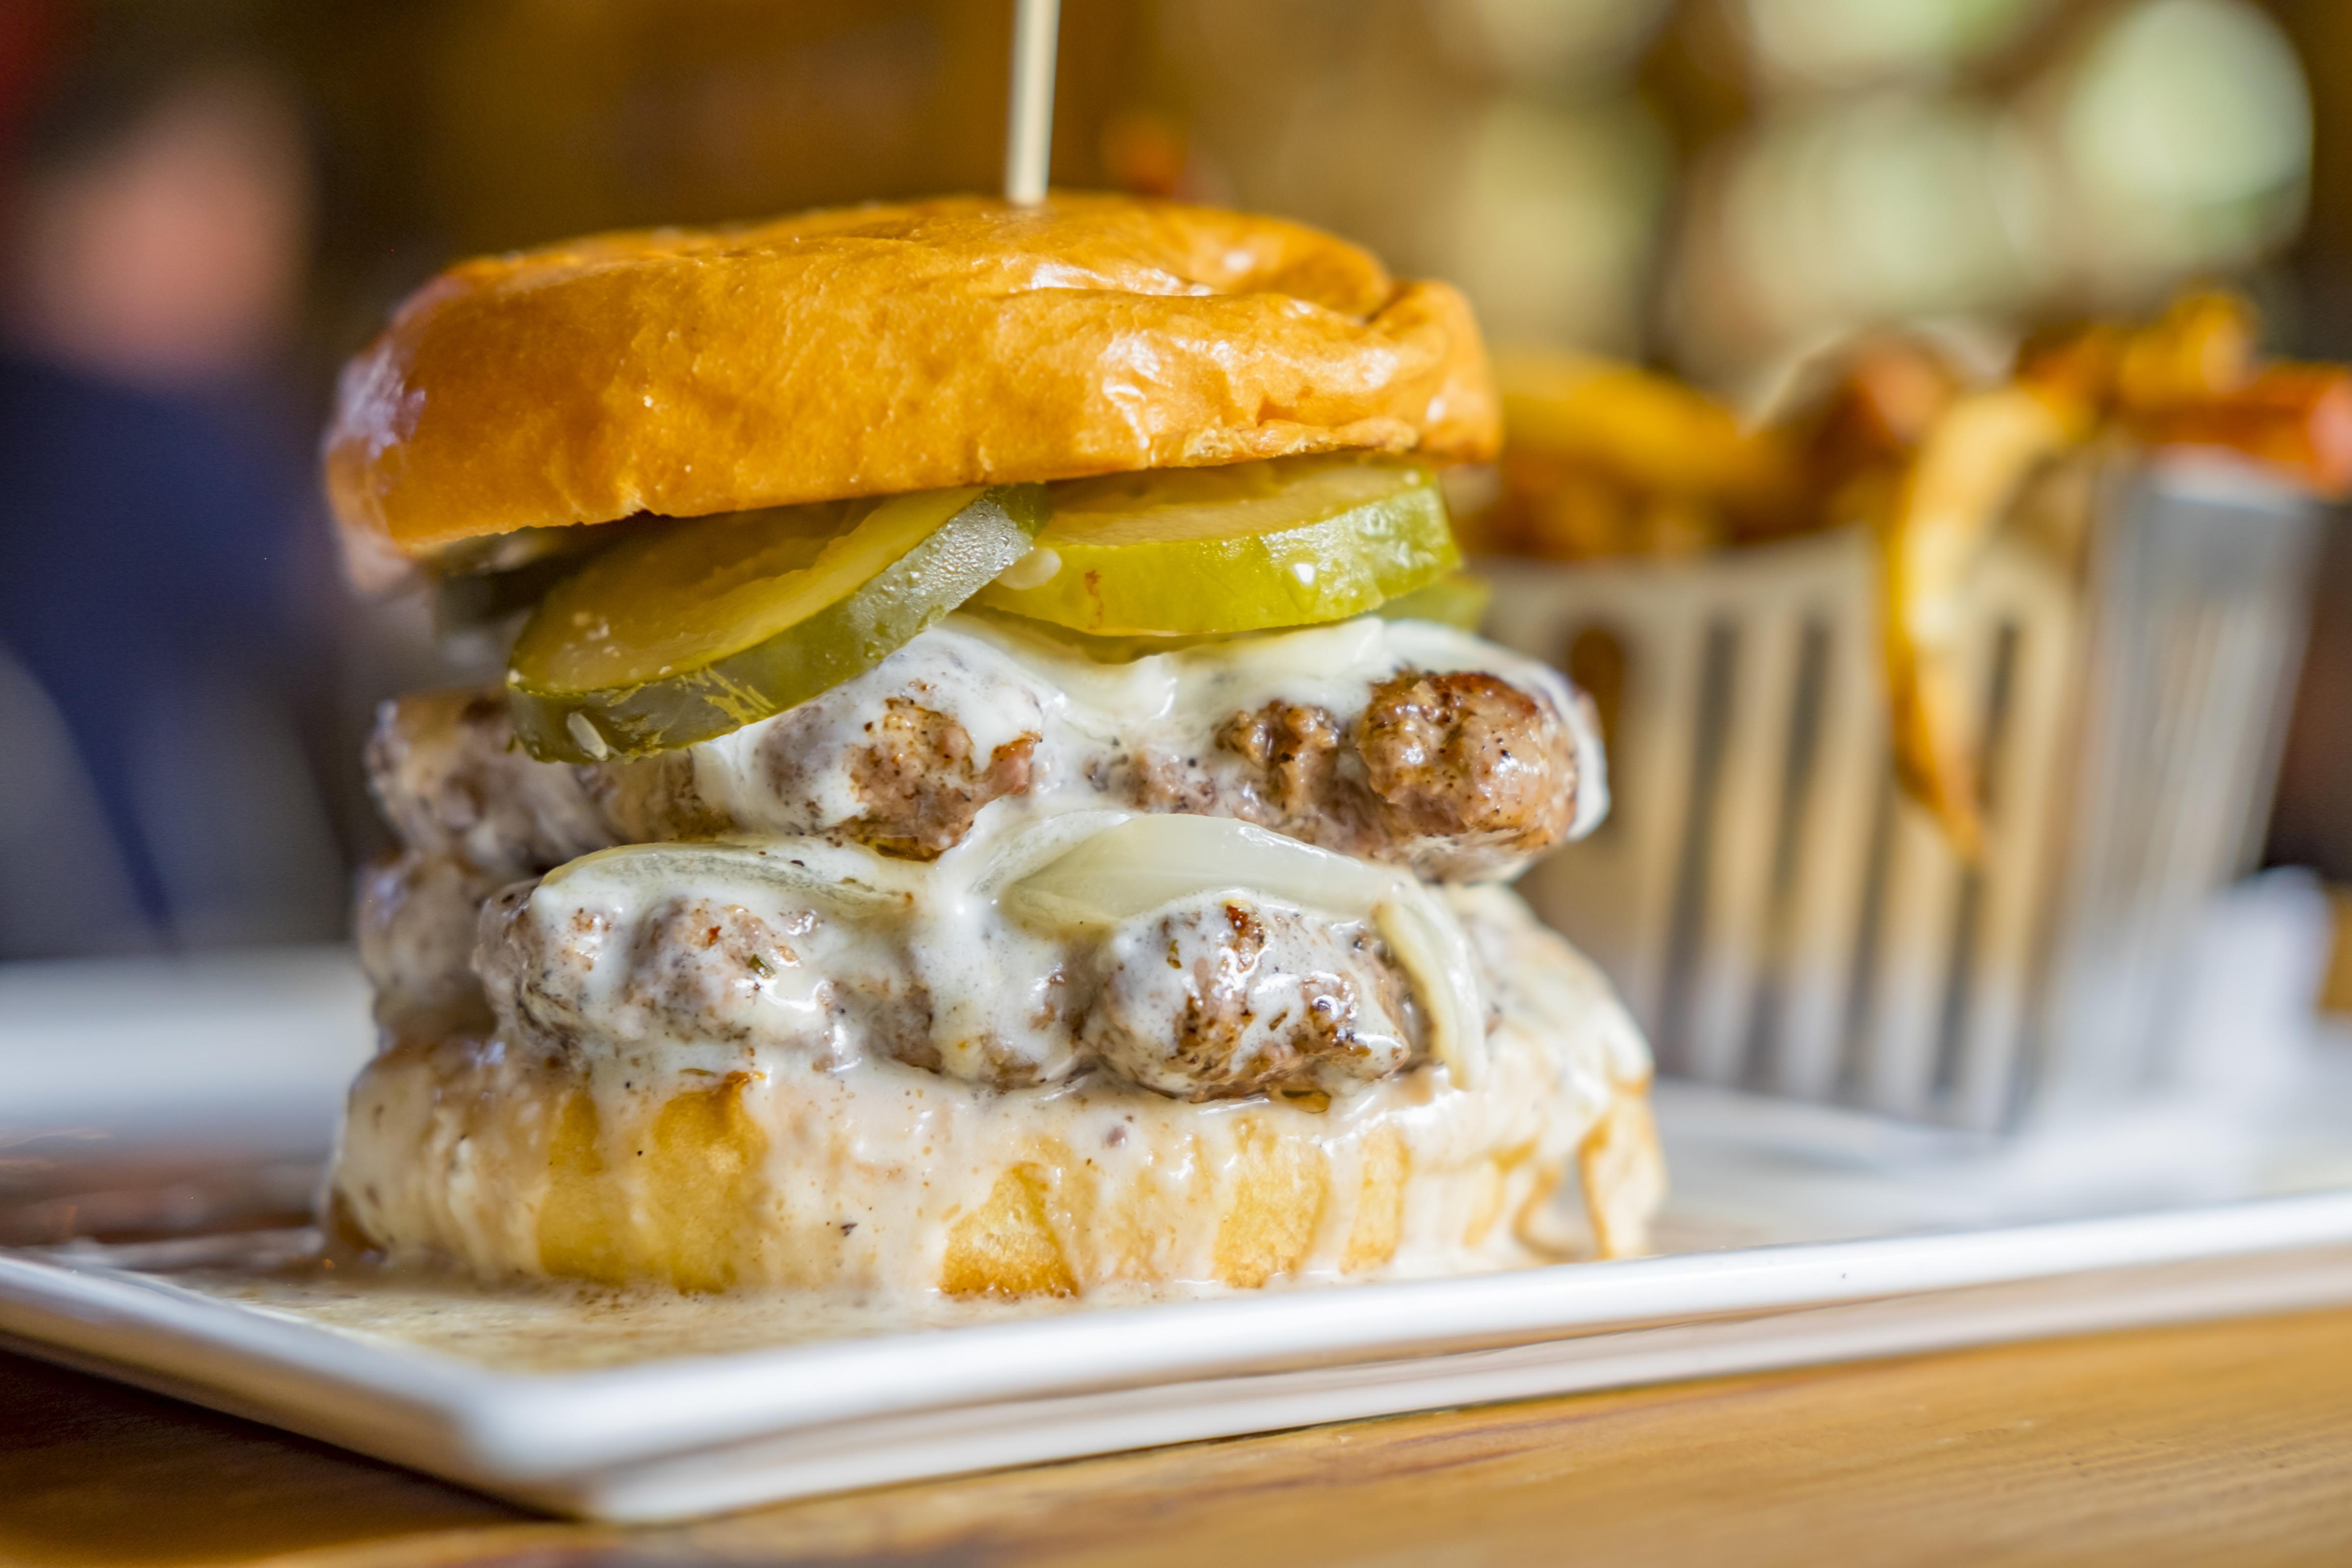 The double cheeseburger with pickles at Hobnob Atlanta